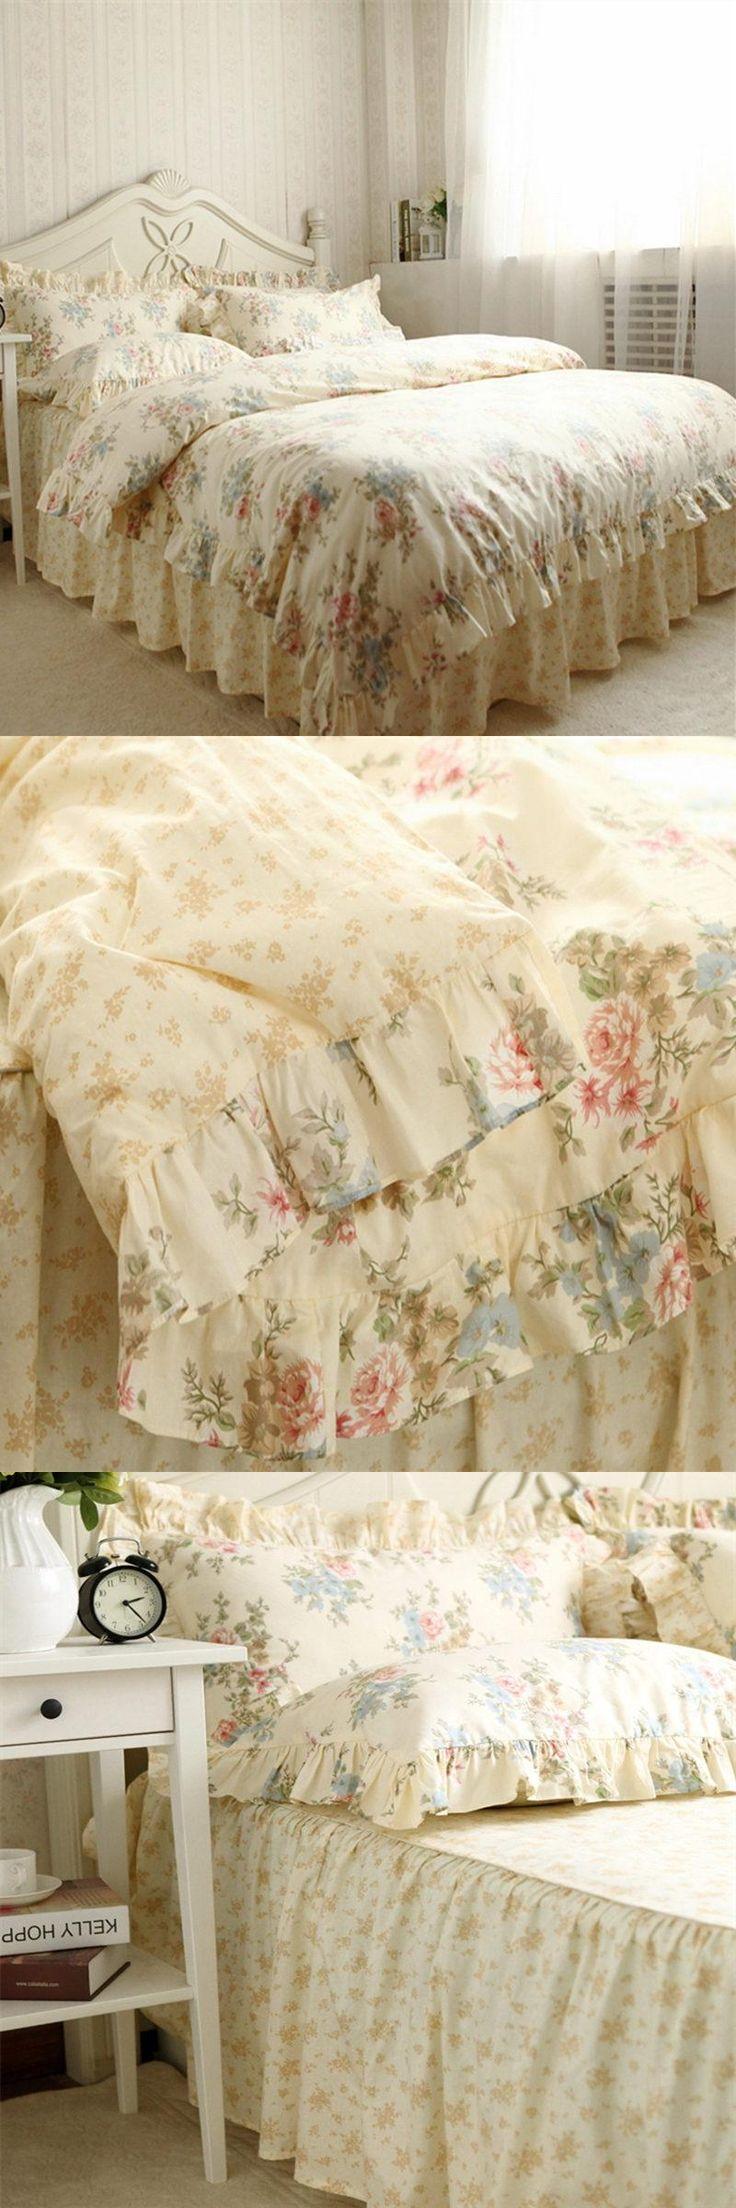 best 25+ ruffle bedspread ideas on pinterest | ruffle quilt